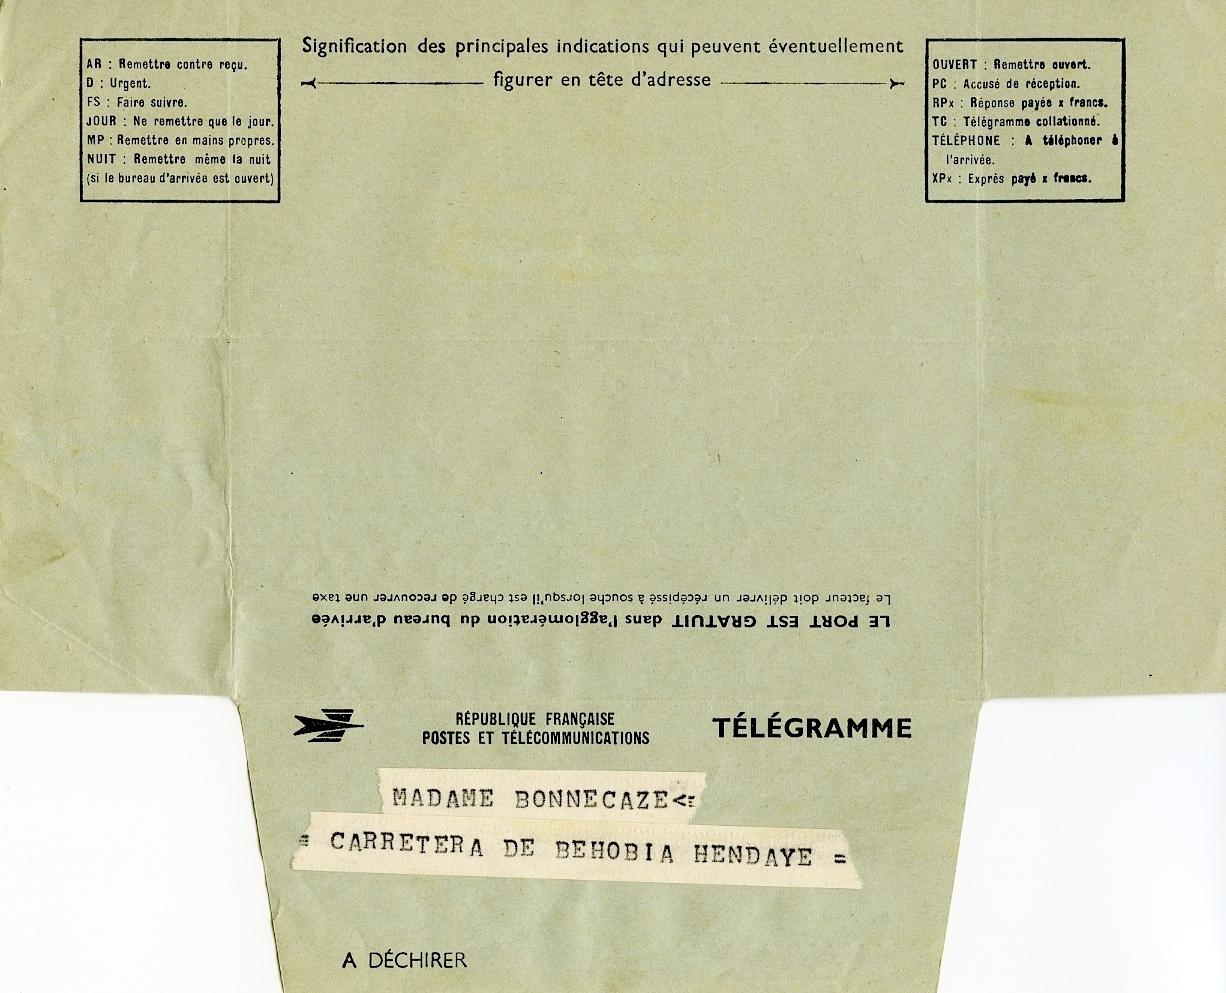 Telegrama de la familia Balenciaga a madame Bonnecaze